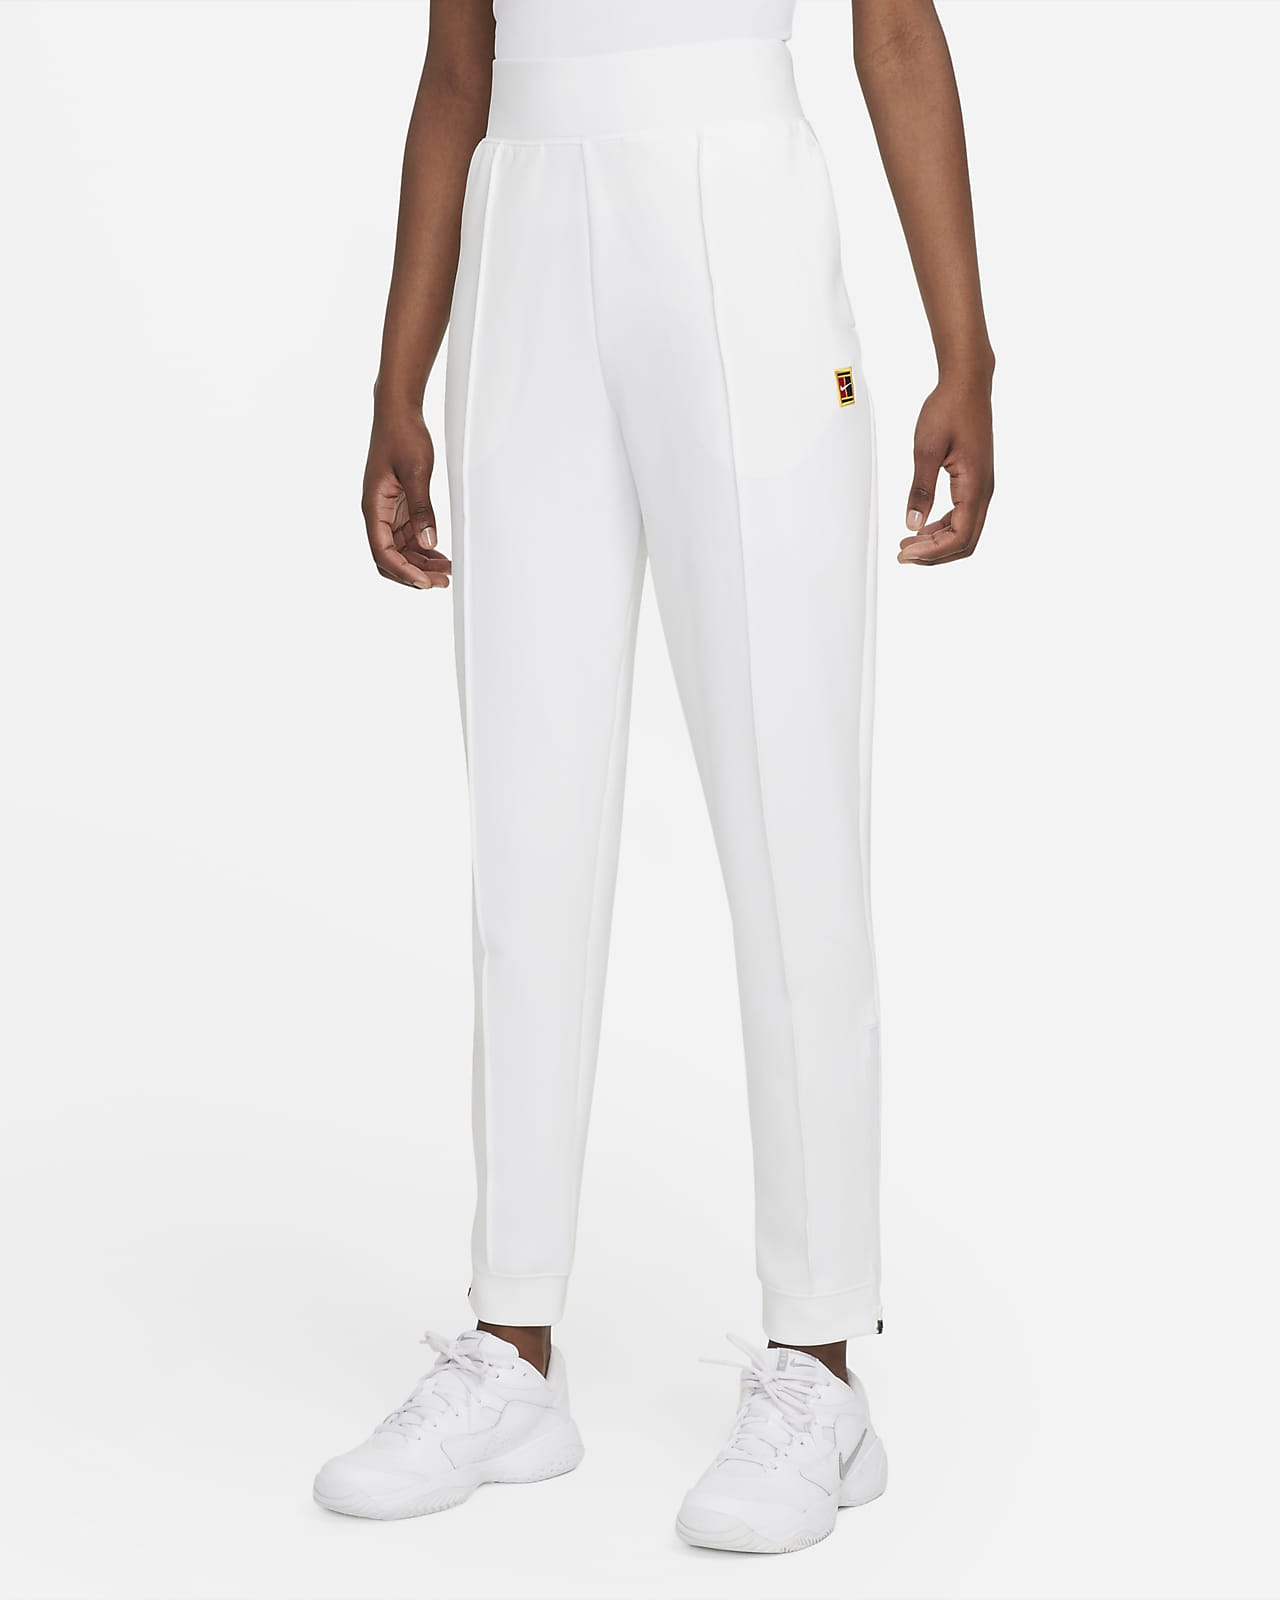 NikeCourt Dri-FIT Pantalons de tennis de teixit Knit - Dona